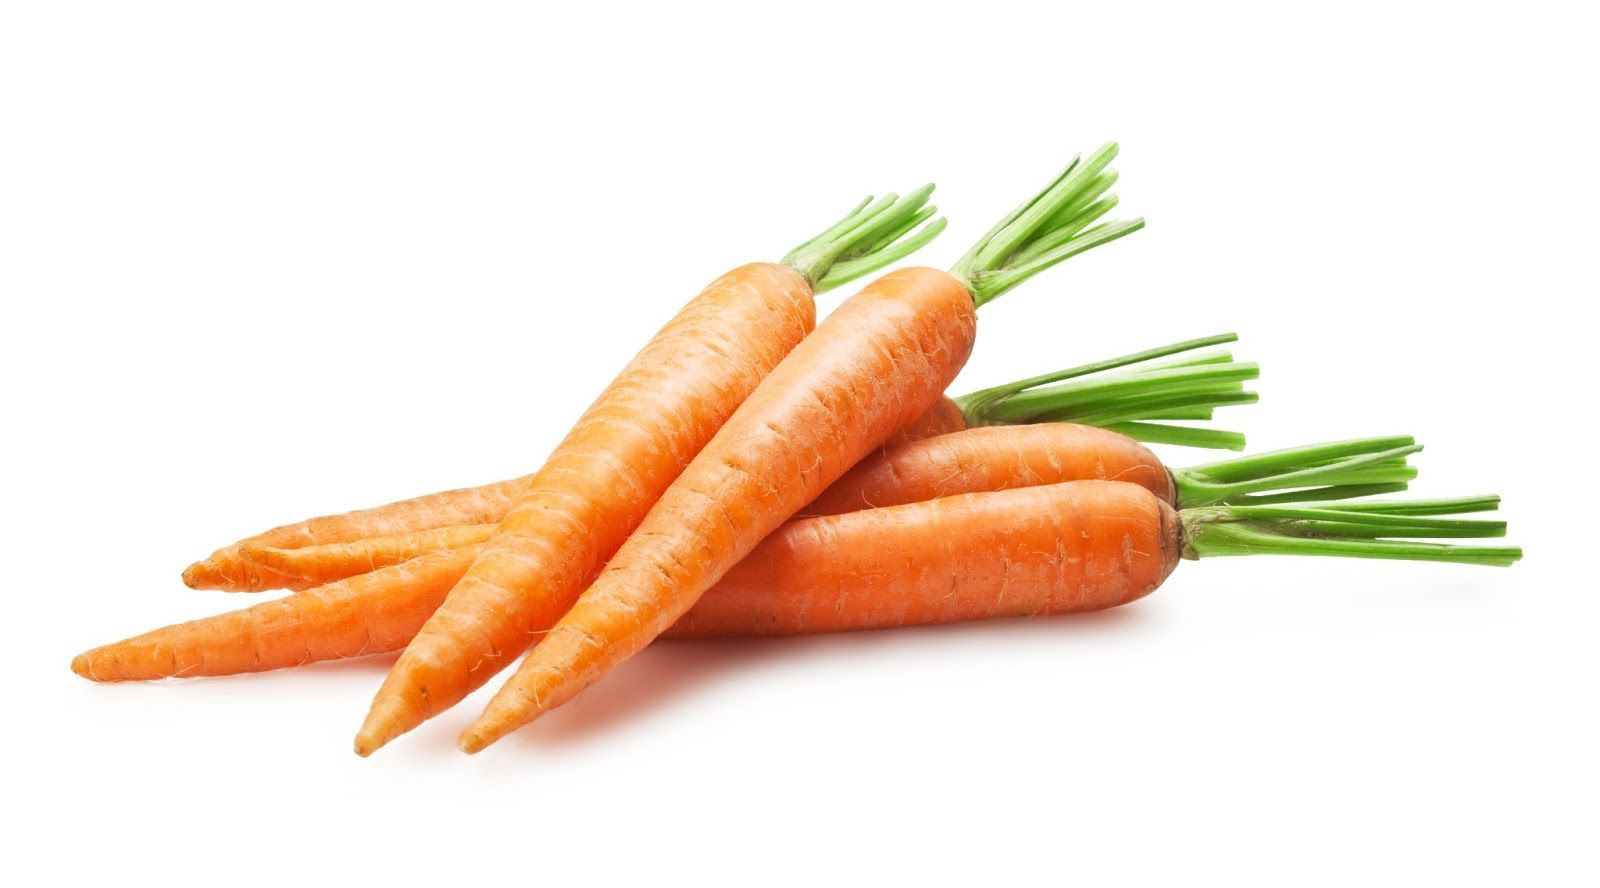 7 Cosas Que No Sabias De Las Zanahorias Sushifactoryblog View zanahoria's puzzles on jigsaw planet. 7 cosas que no sabias de las zanahorias